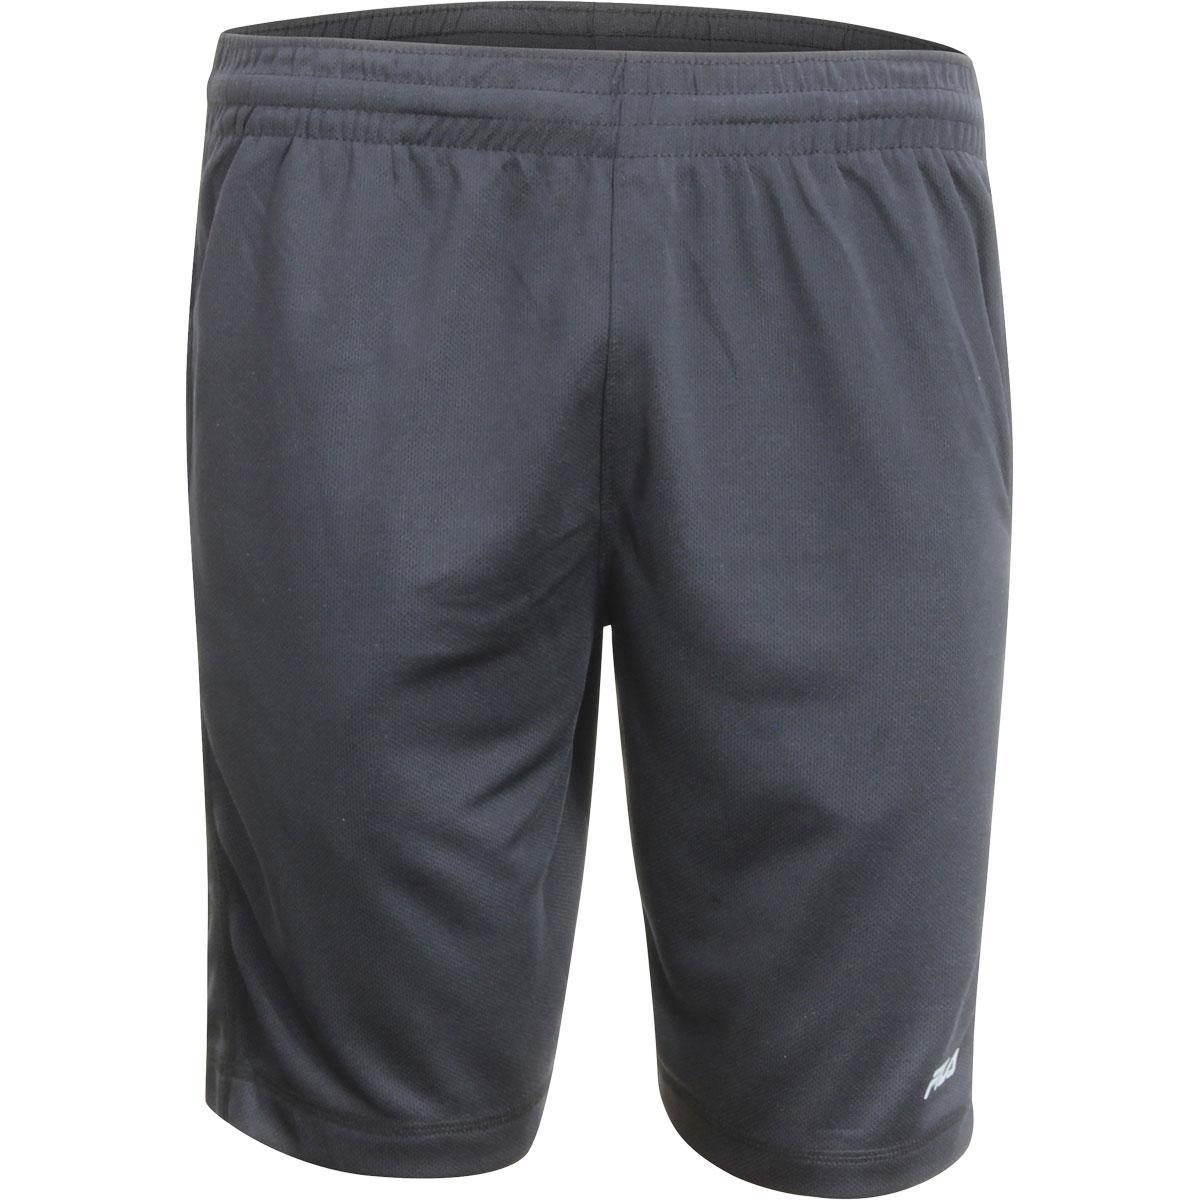 Image of Fila Men's Sidewalk Drawstring Mesh Shorts - Black/Black - Large